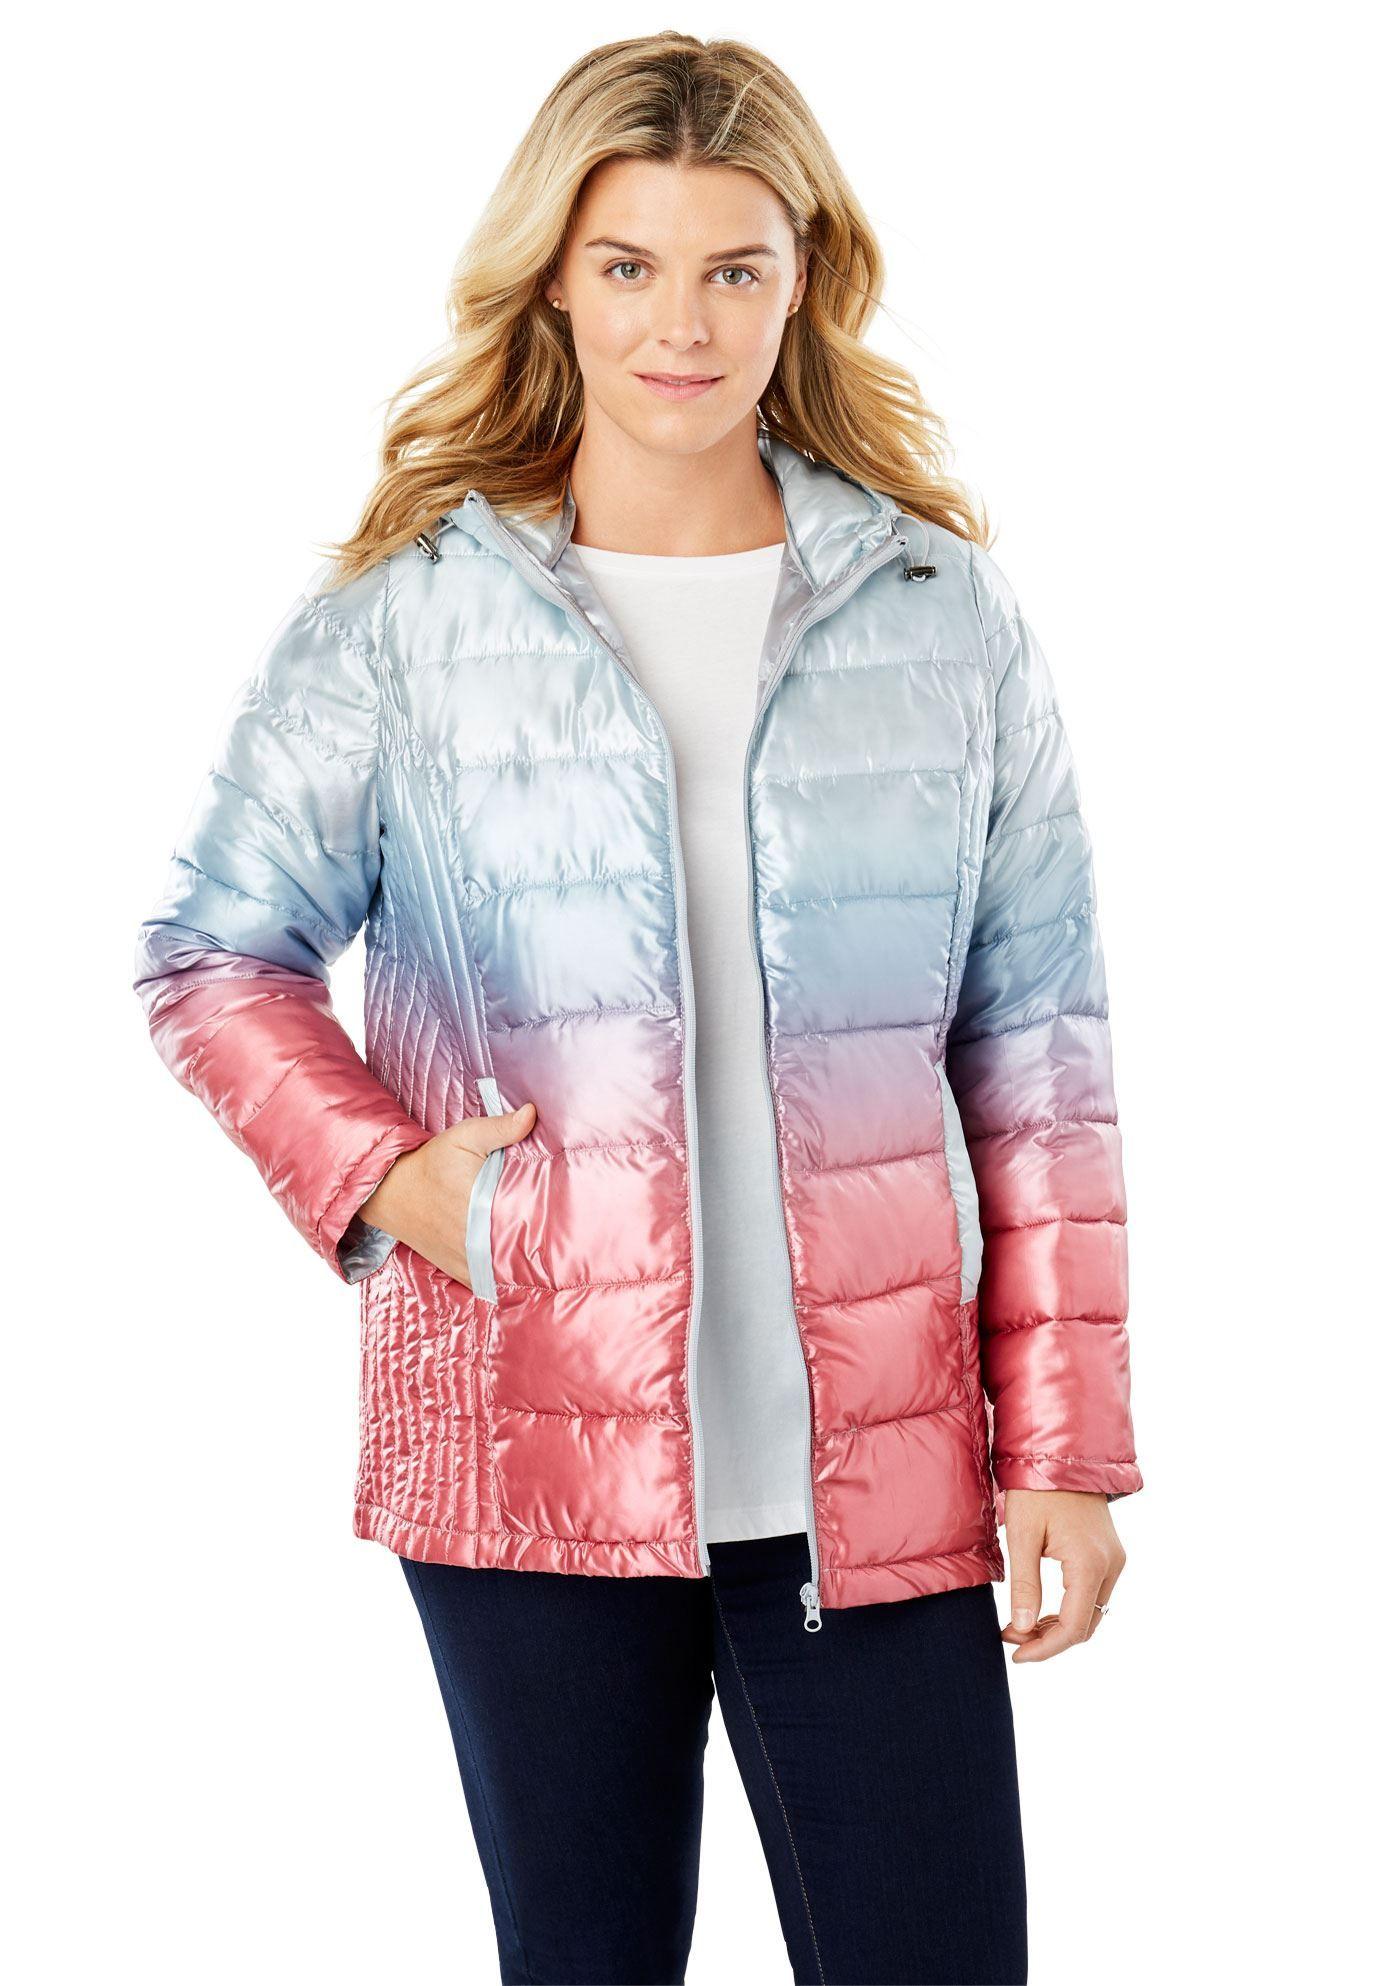 786955d8642 Packable Puffer Jacket - Women s Plus Size Clothing